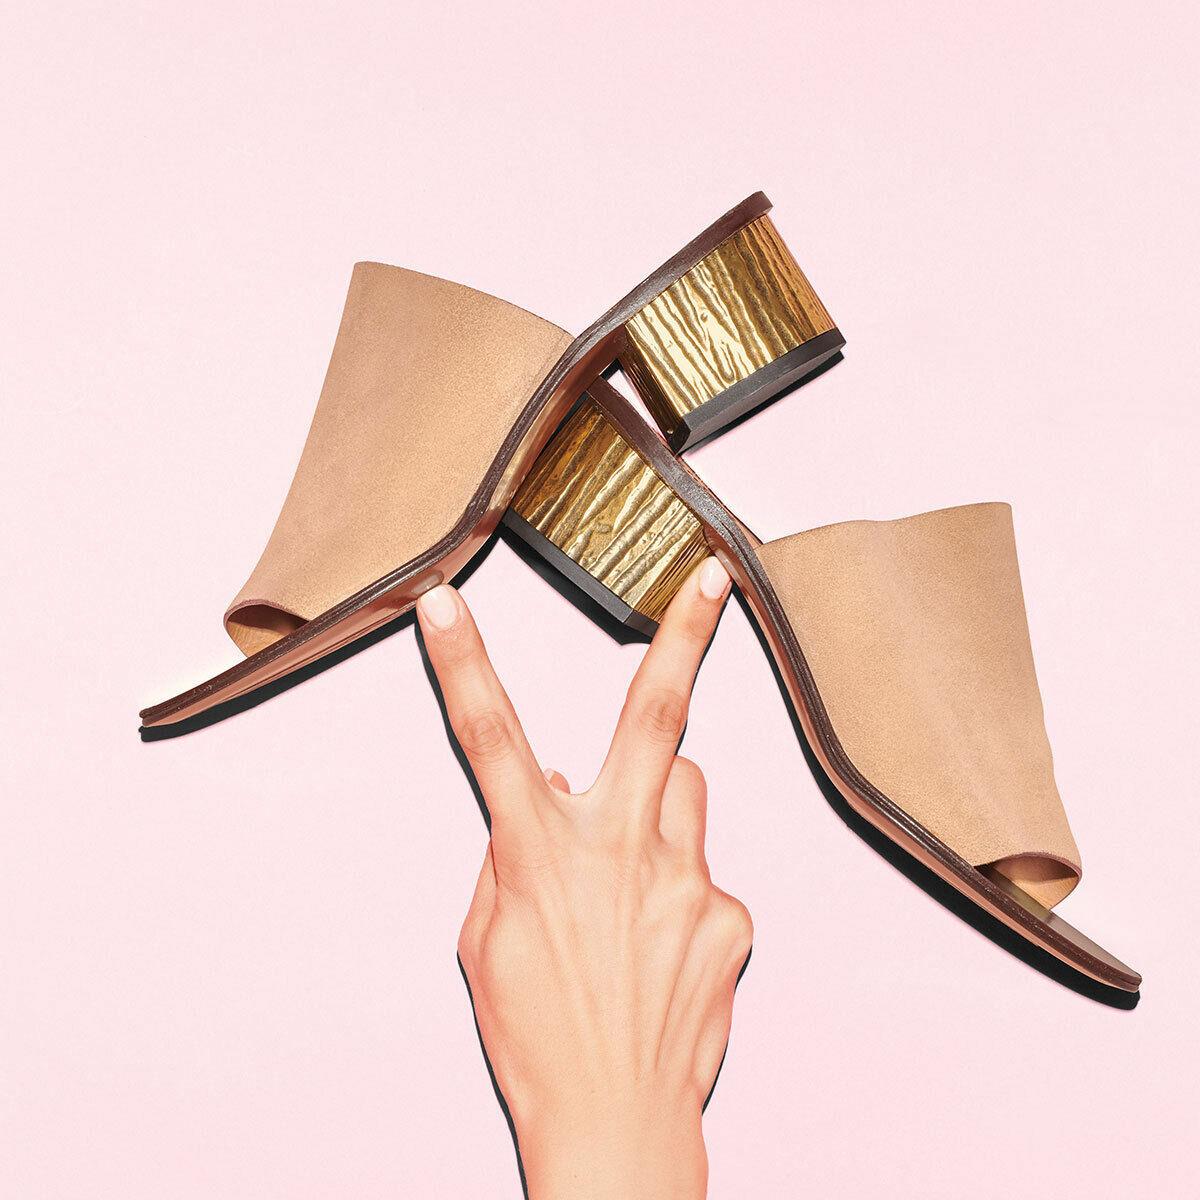 Chloe Qassie Beige  Suede Heeled Mules Sandals Slides Dimensione 40  negozio di sconto